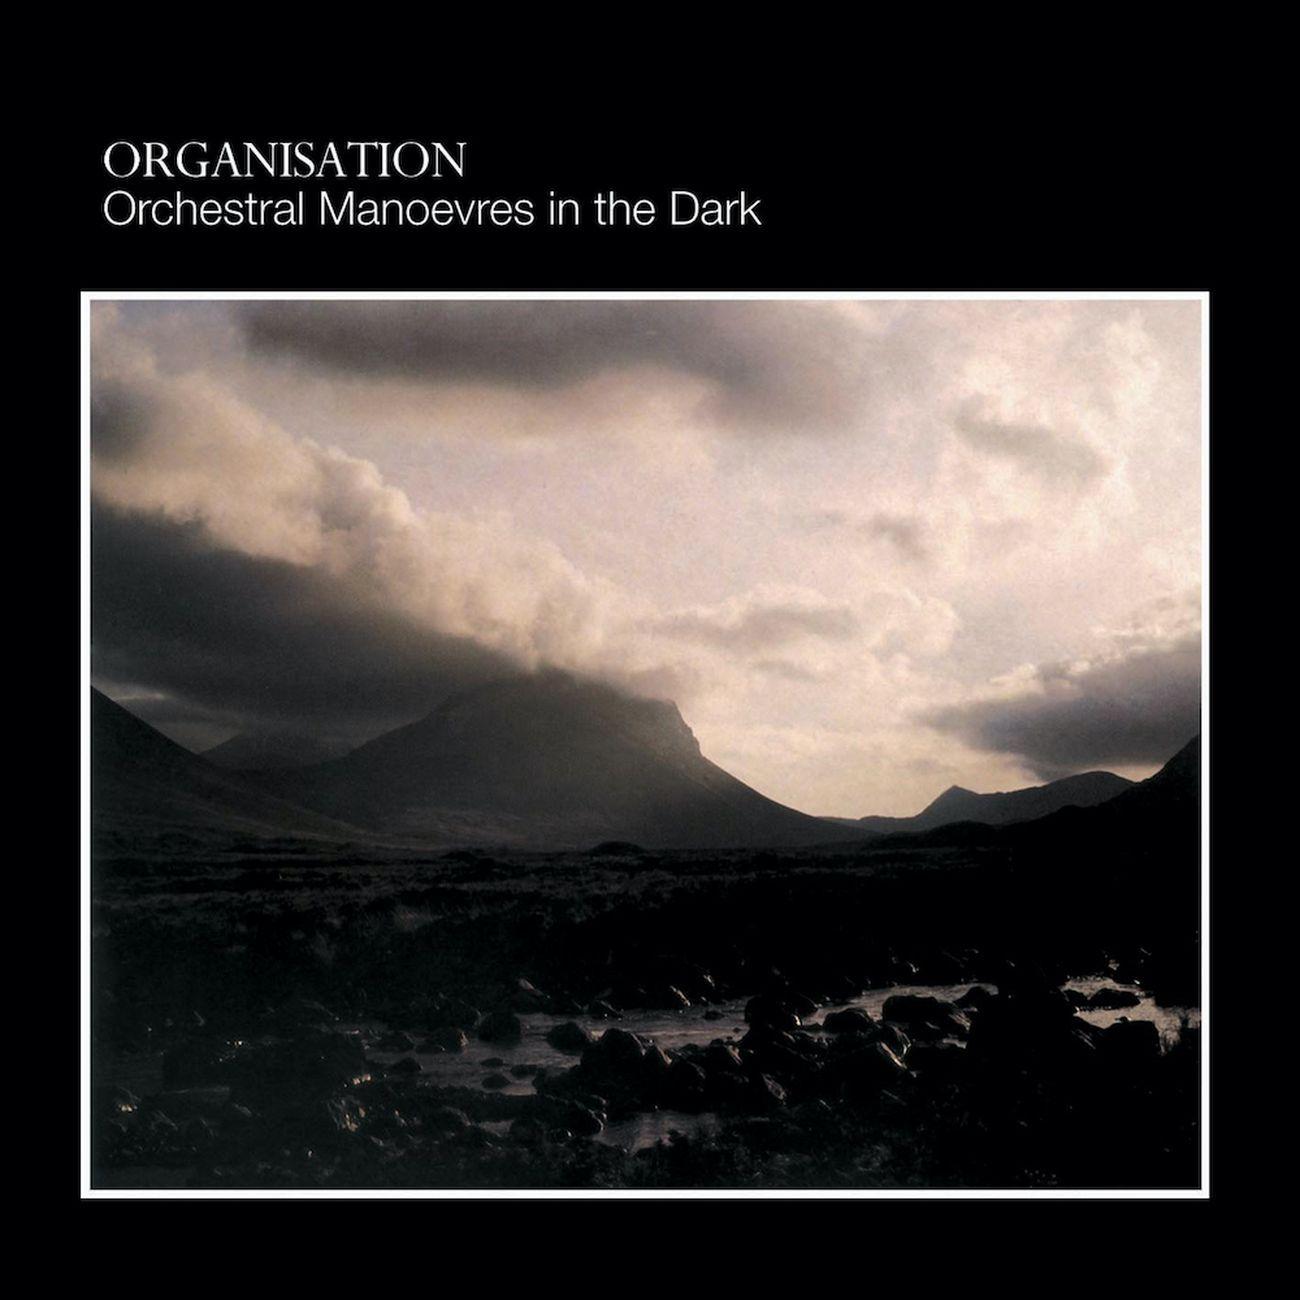 OMD, Organization (1980), copertina dell'album